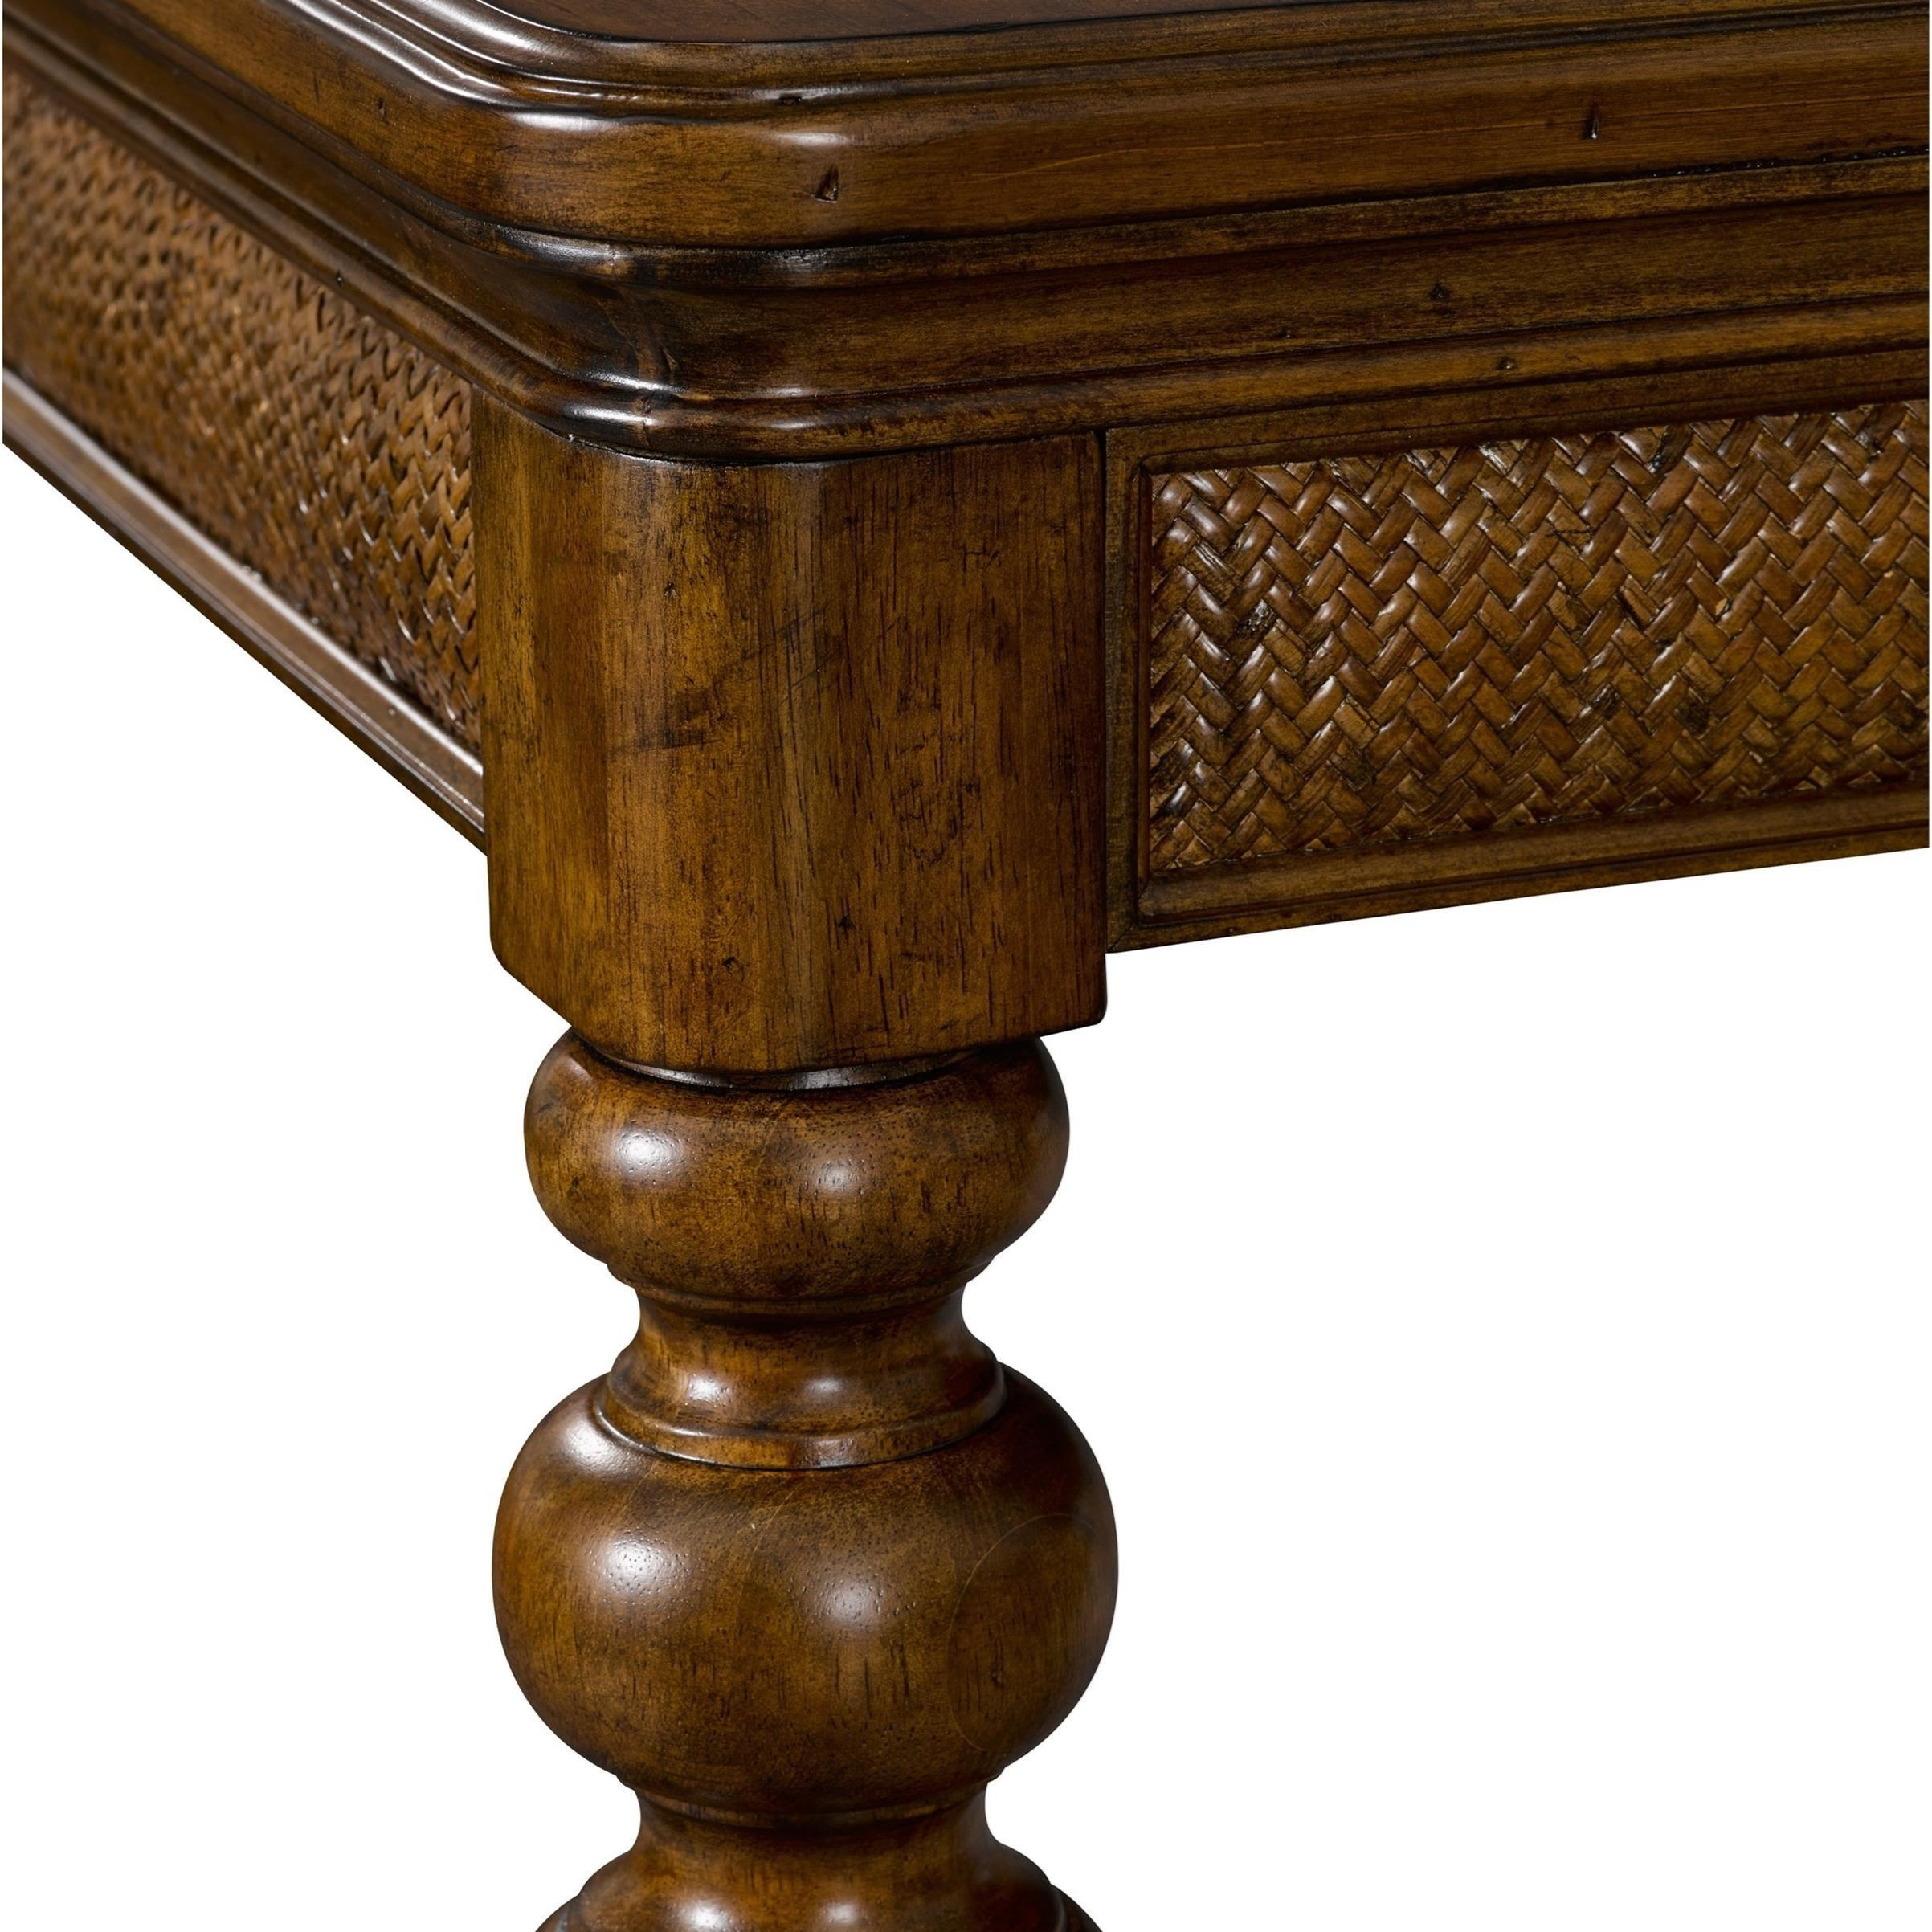 Broyhill Furniture Amalie Bay 4548 542 Leg Dining Table